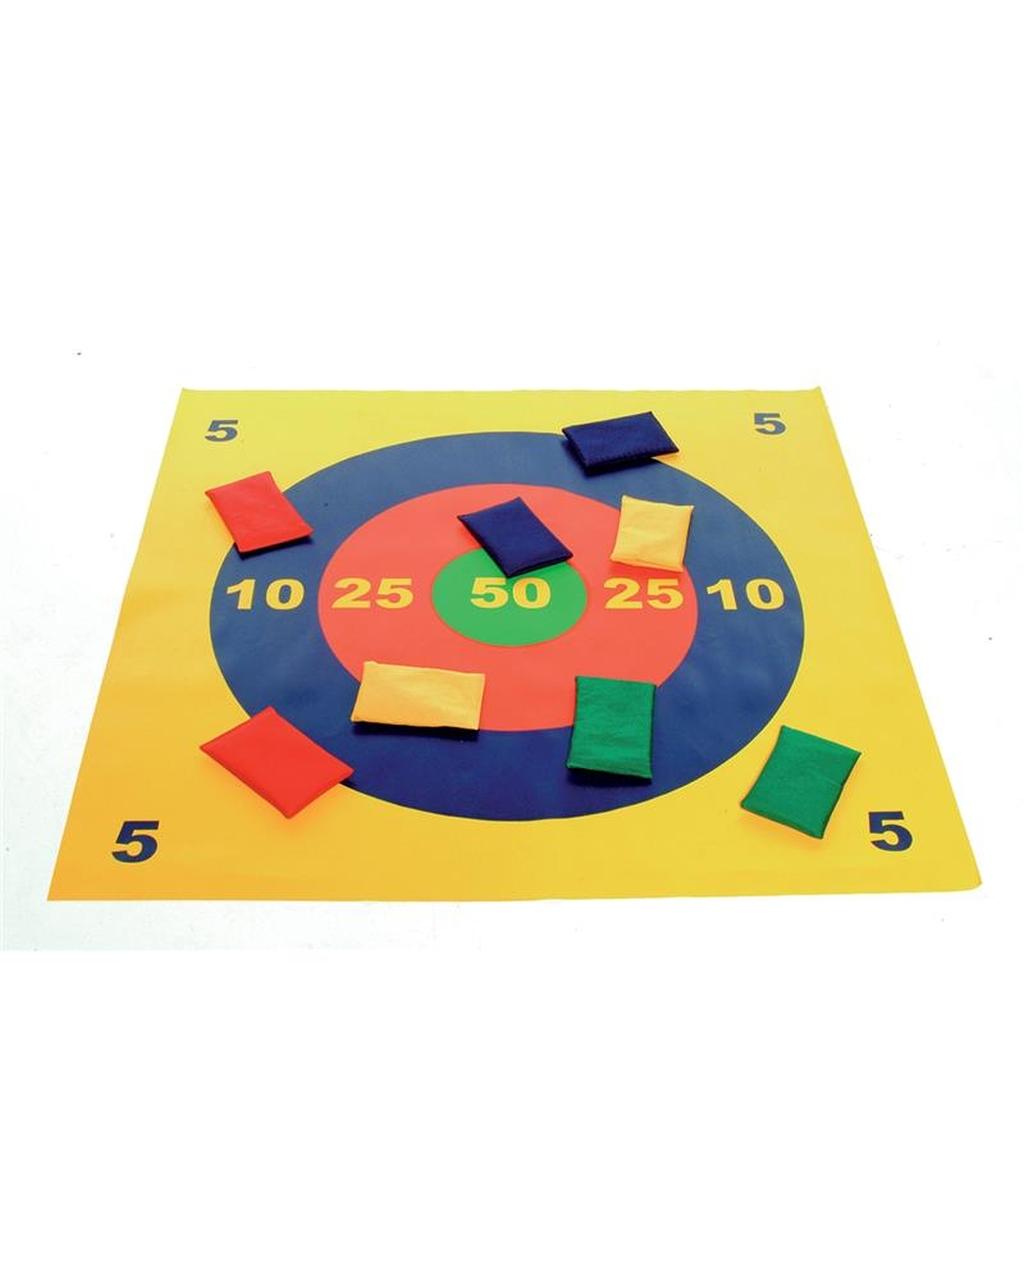 Beanbag Target Game